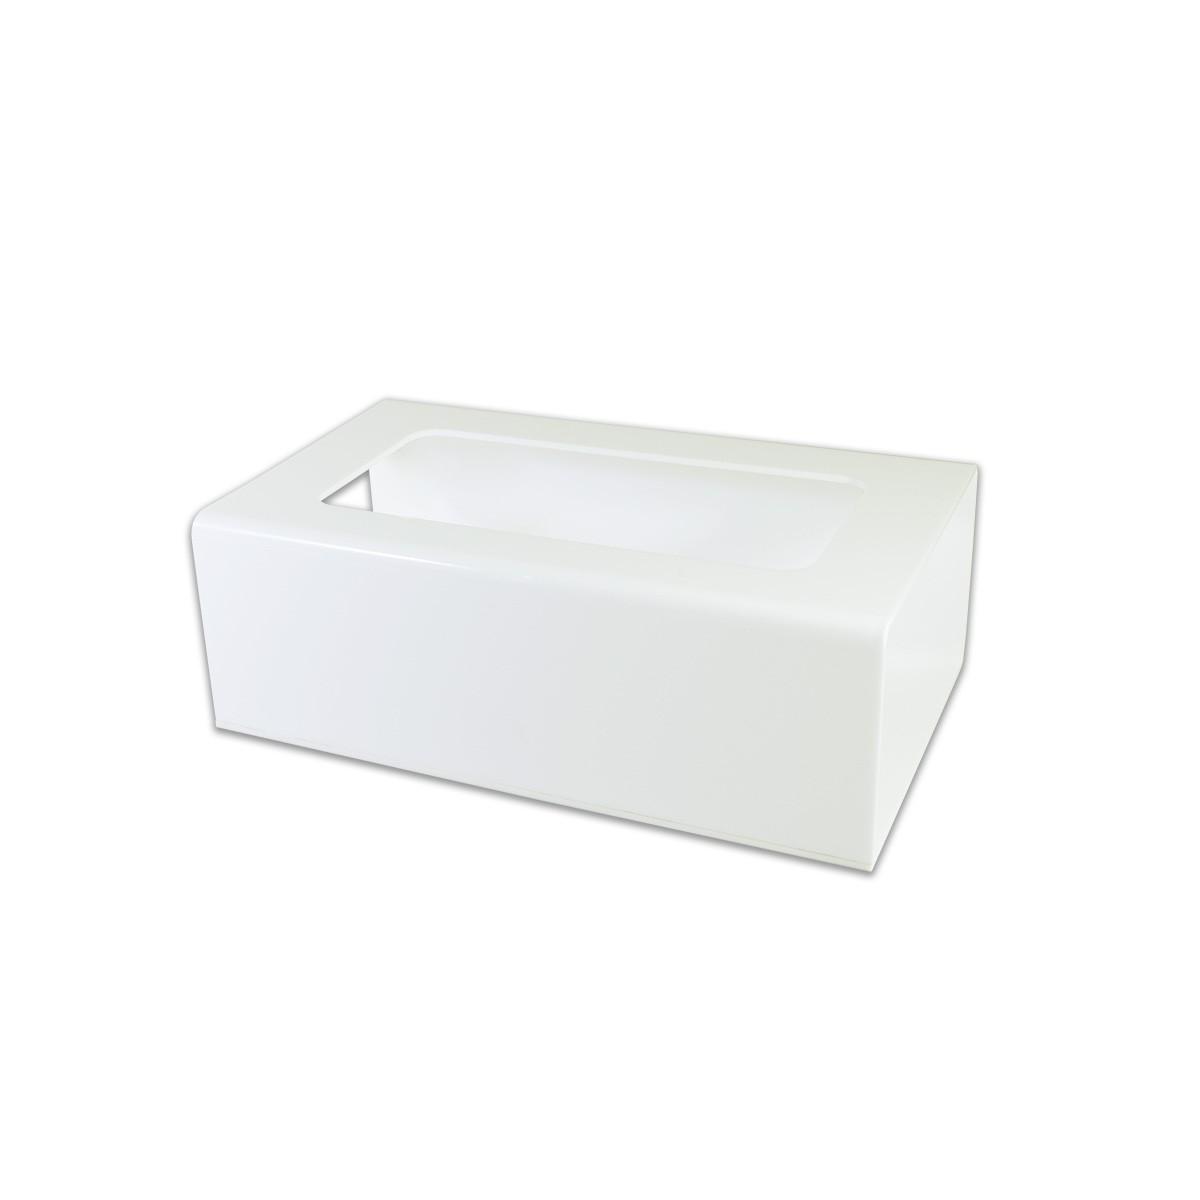 Acrylic Dispenser for Bouffant Caps 25x12x7cm | 1pc